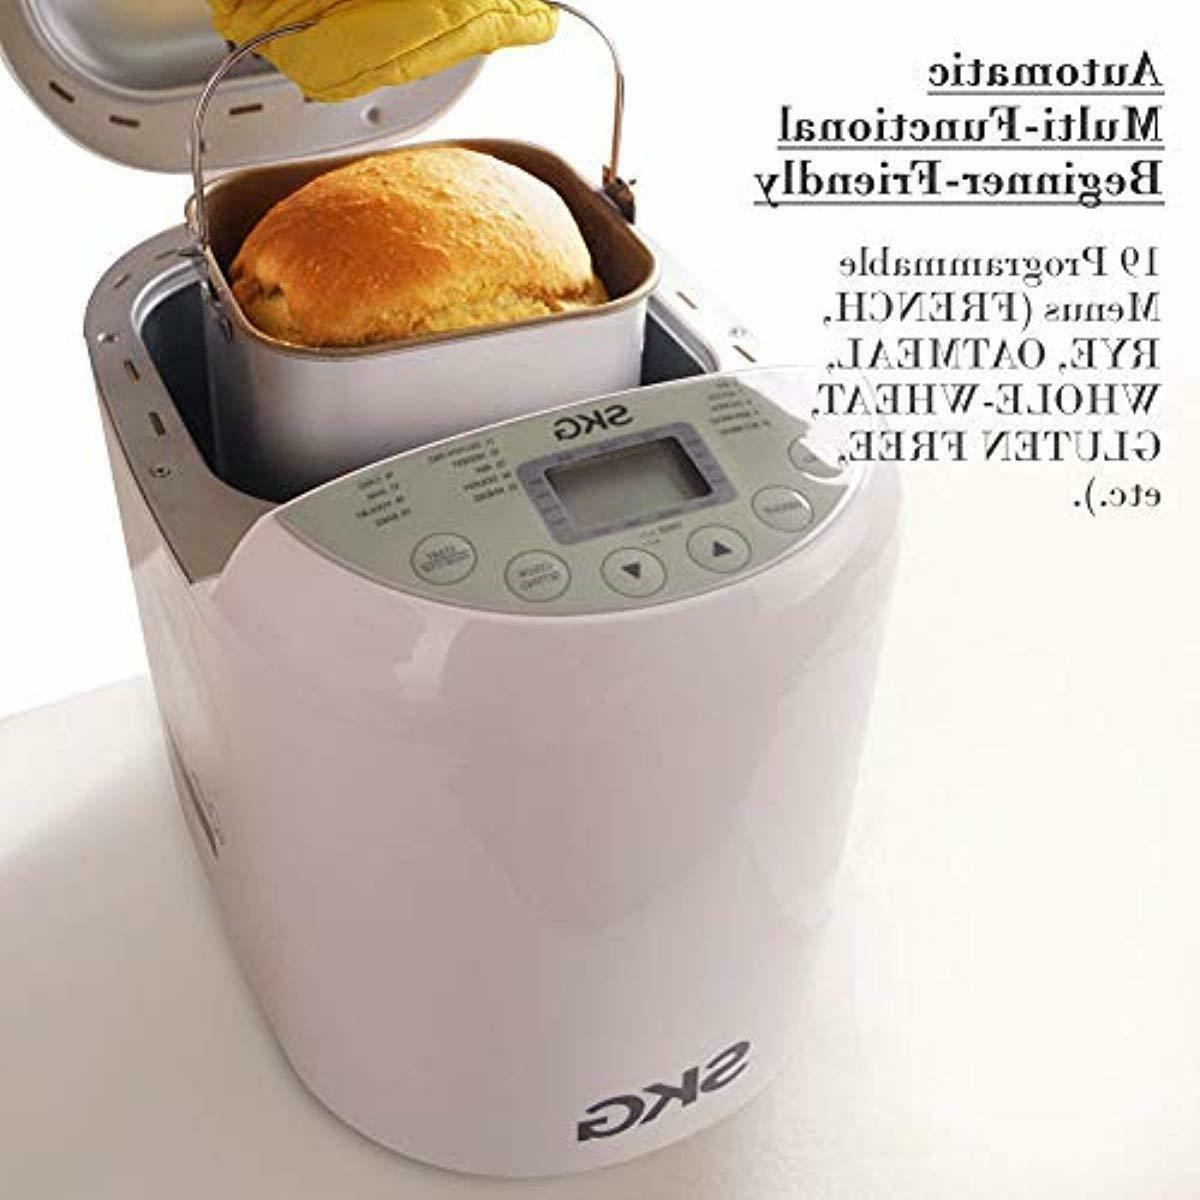 SKG Automatic Bread Machine, Gluten Free 19 Reci